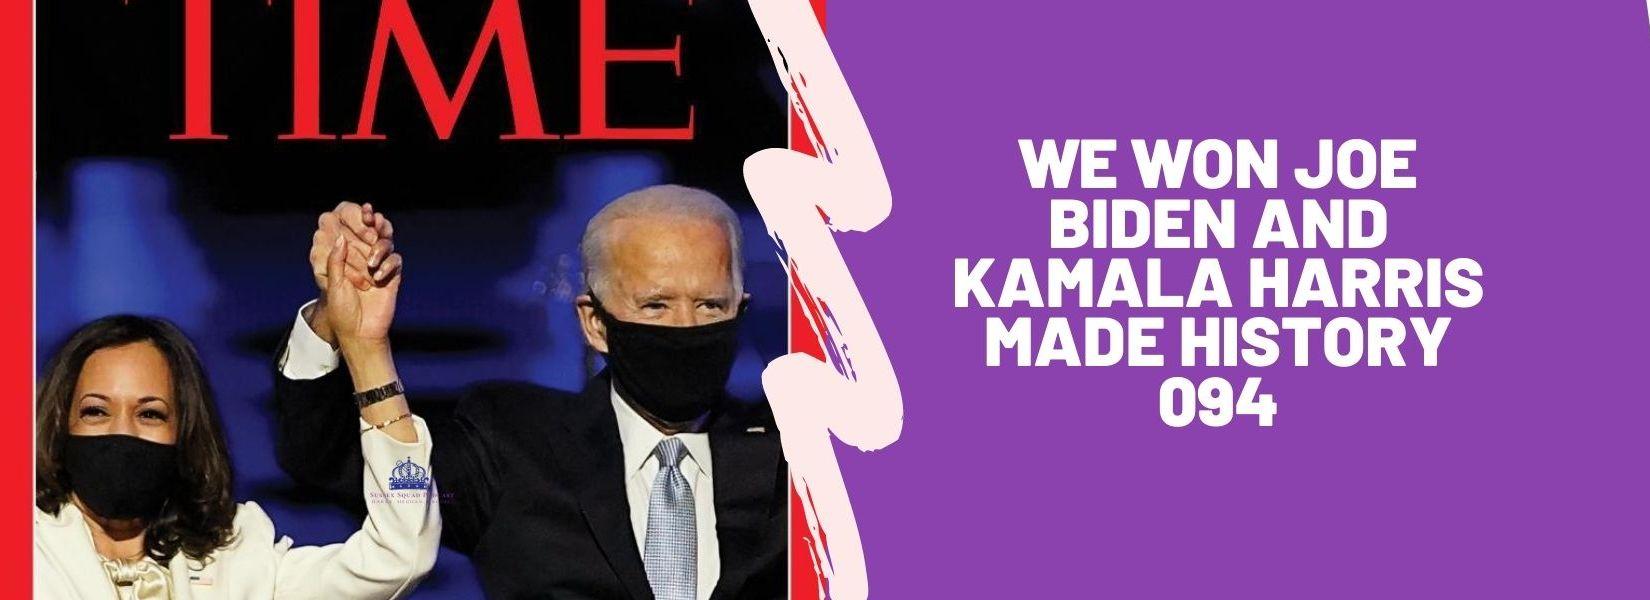 We Won Joe Biden and Kamala Harris Made History 094